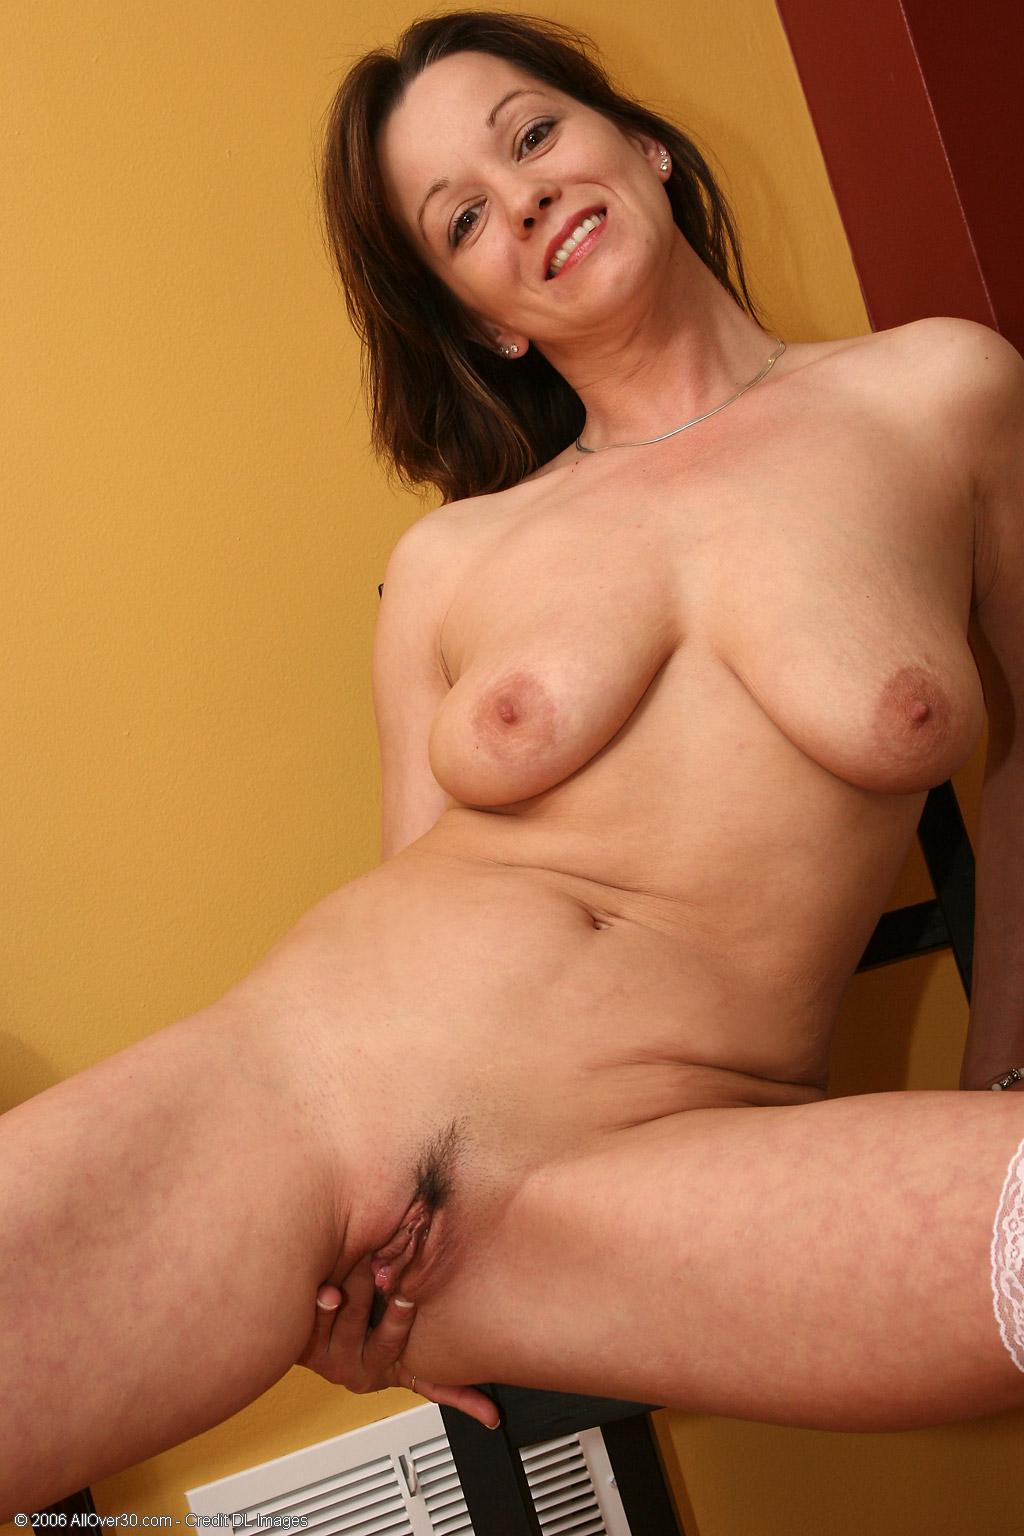 Samantha milf nude